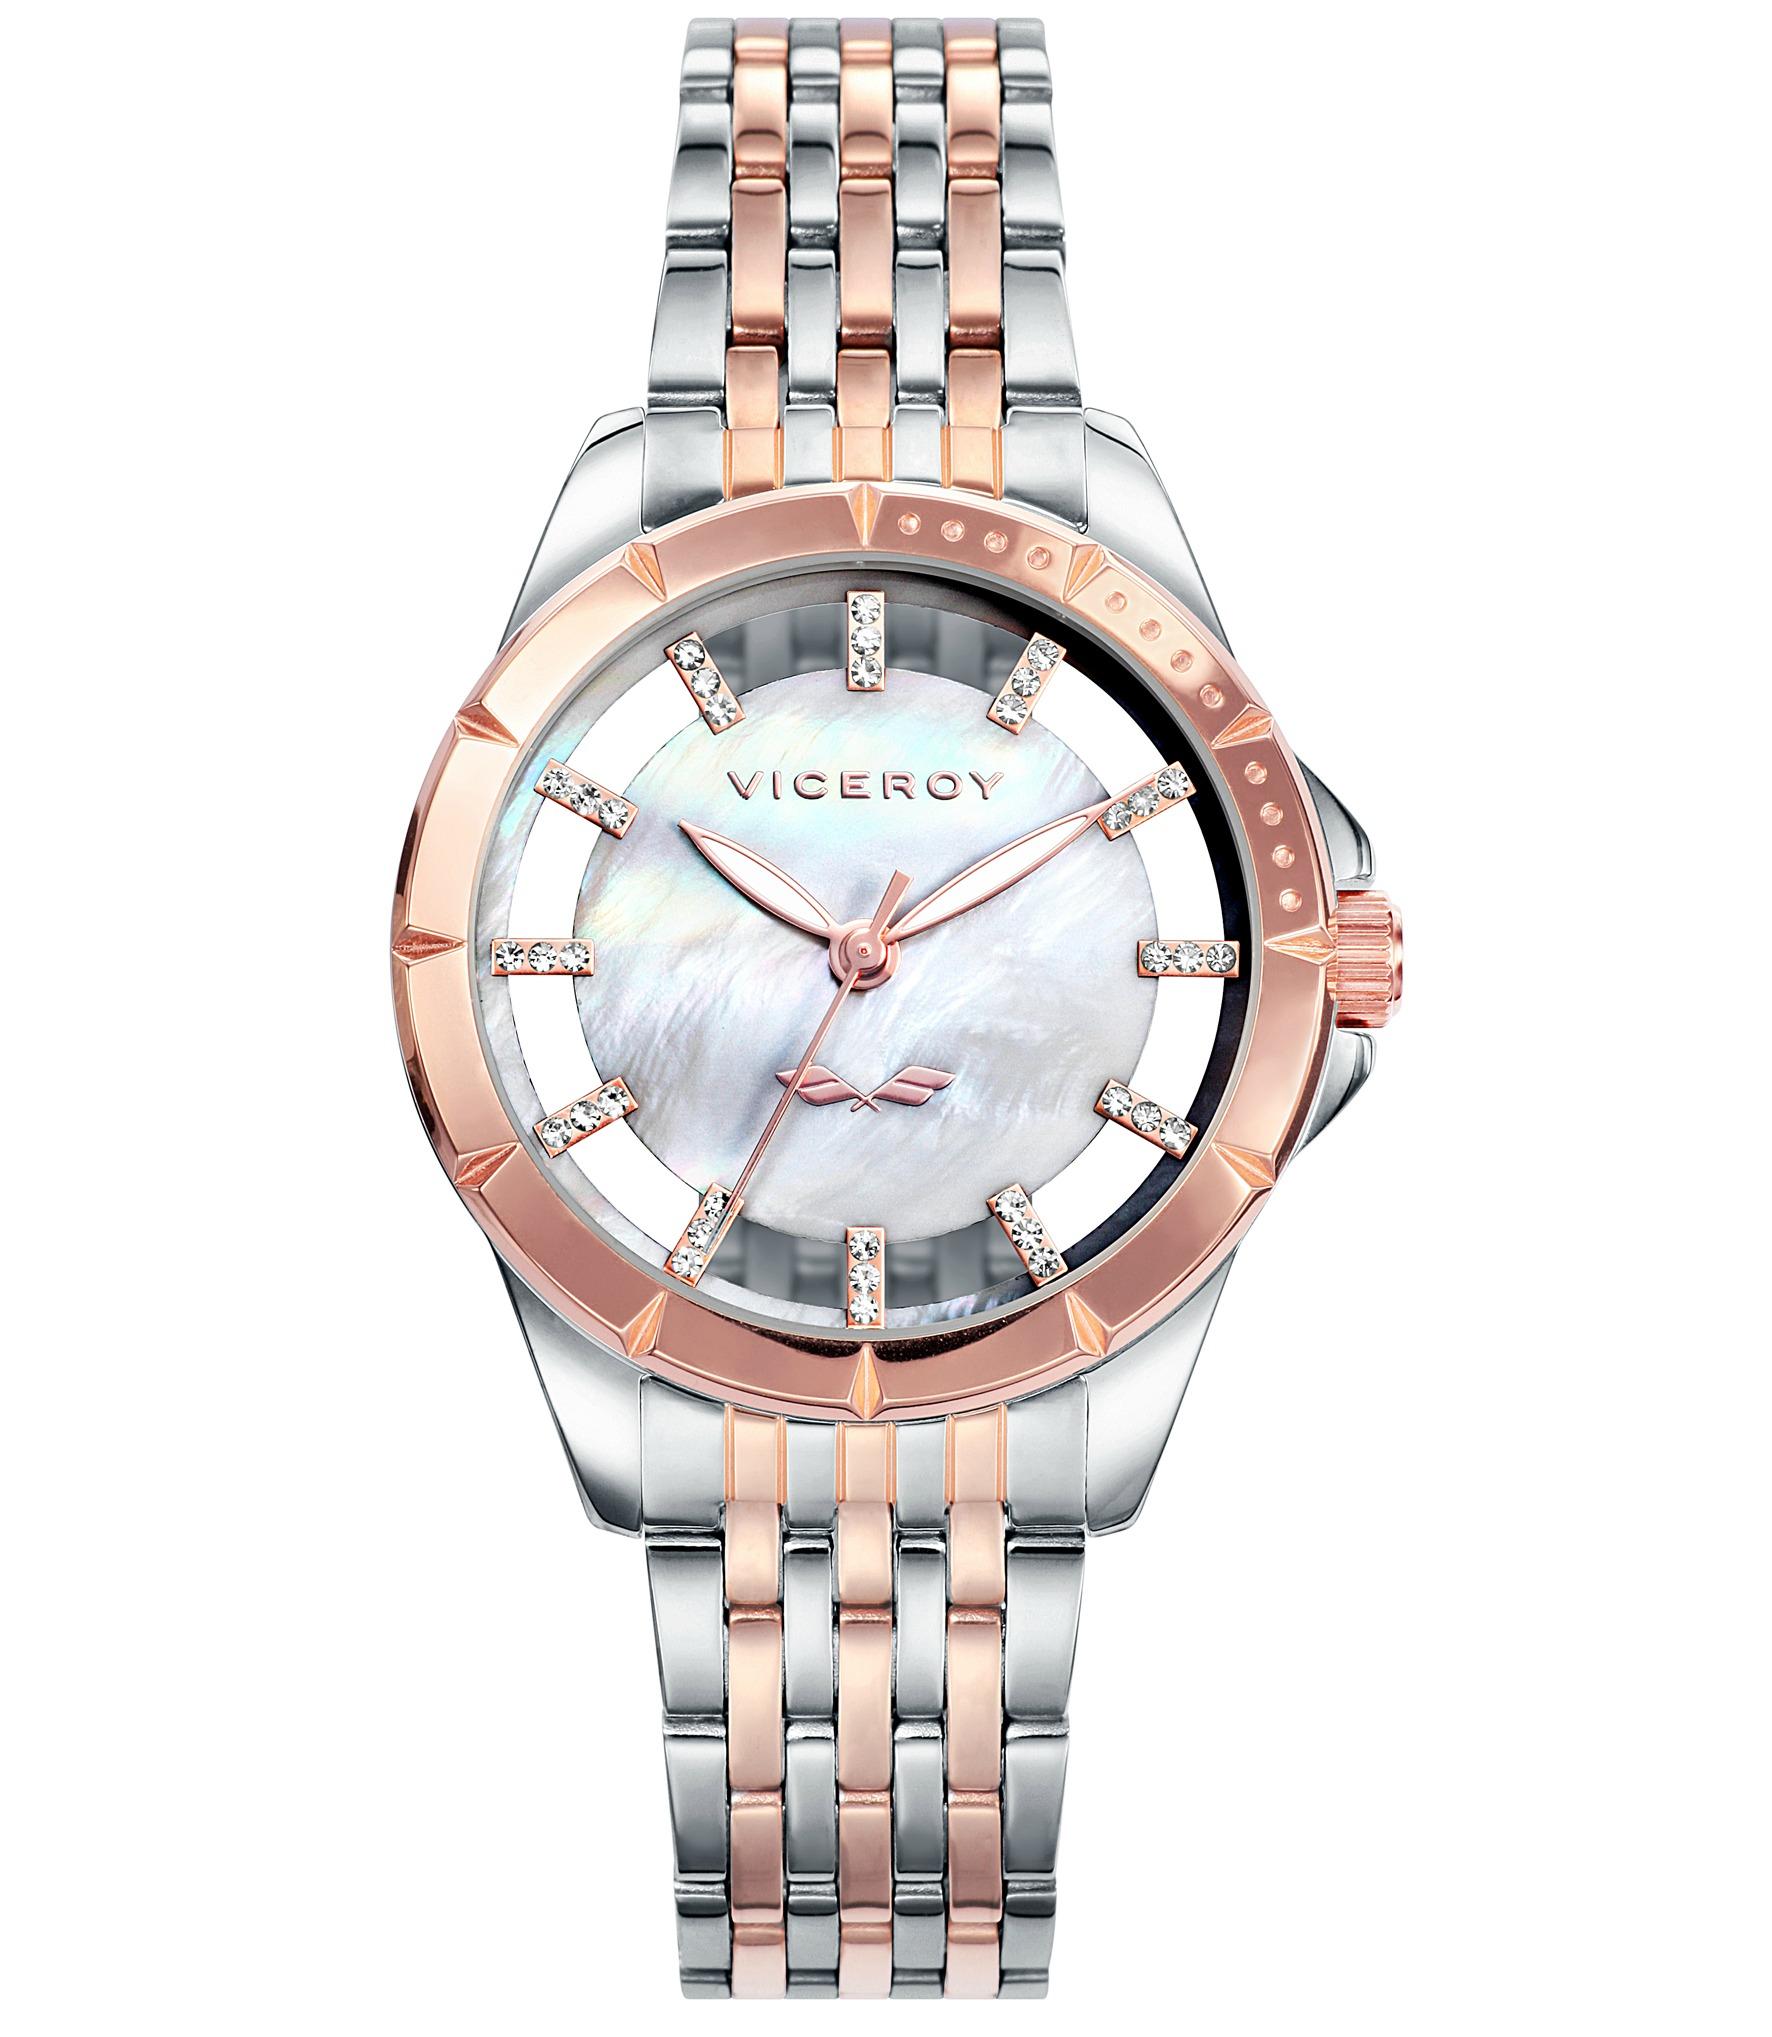 Viceroy Mujer - 119€